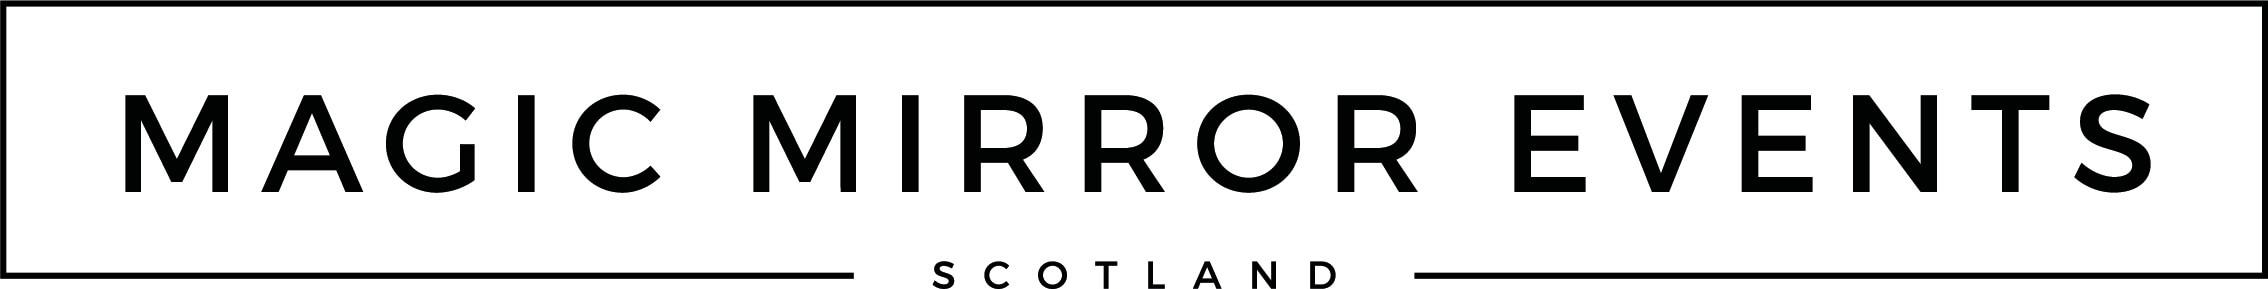 Magic Mirror Events Scotland